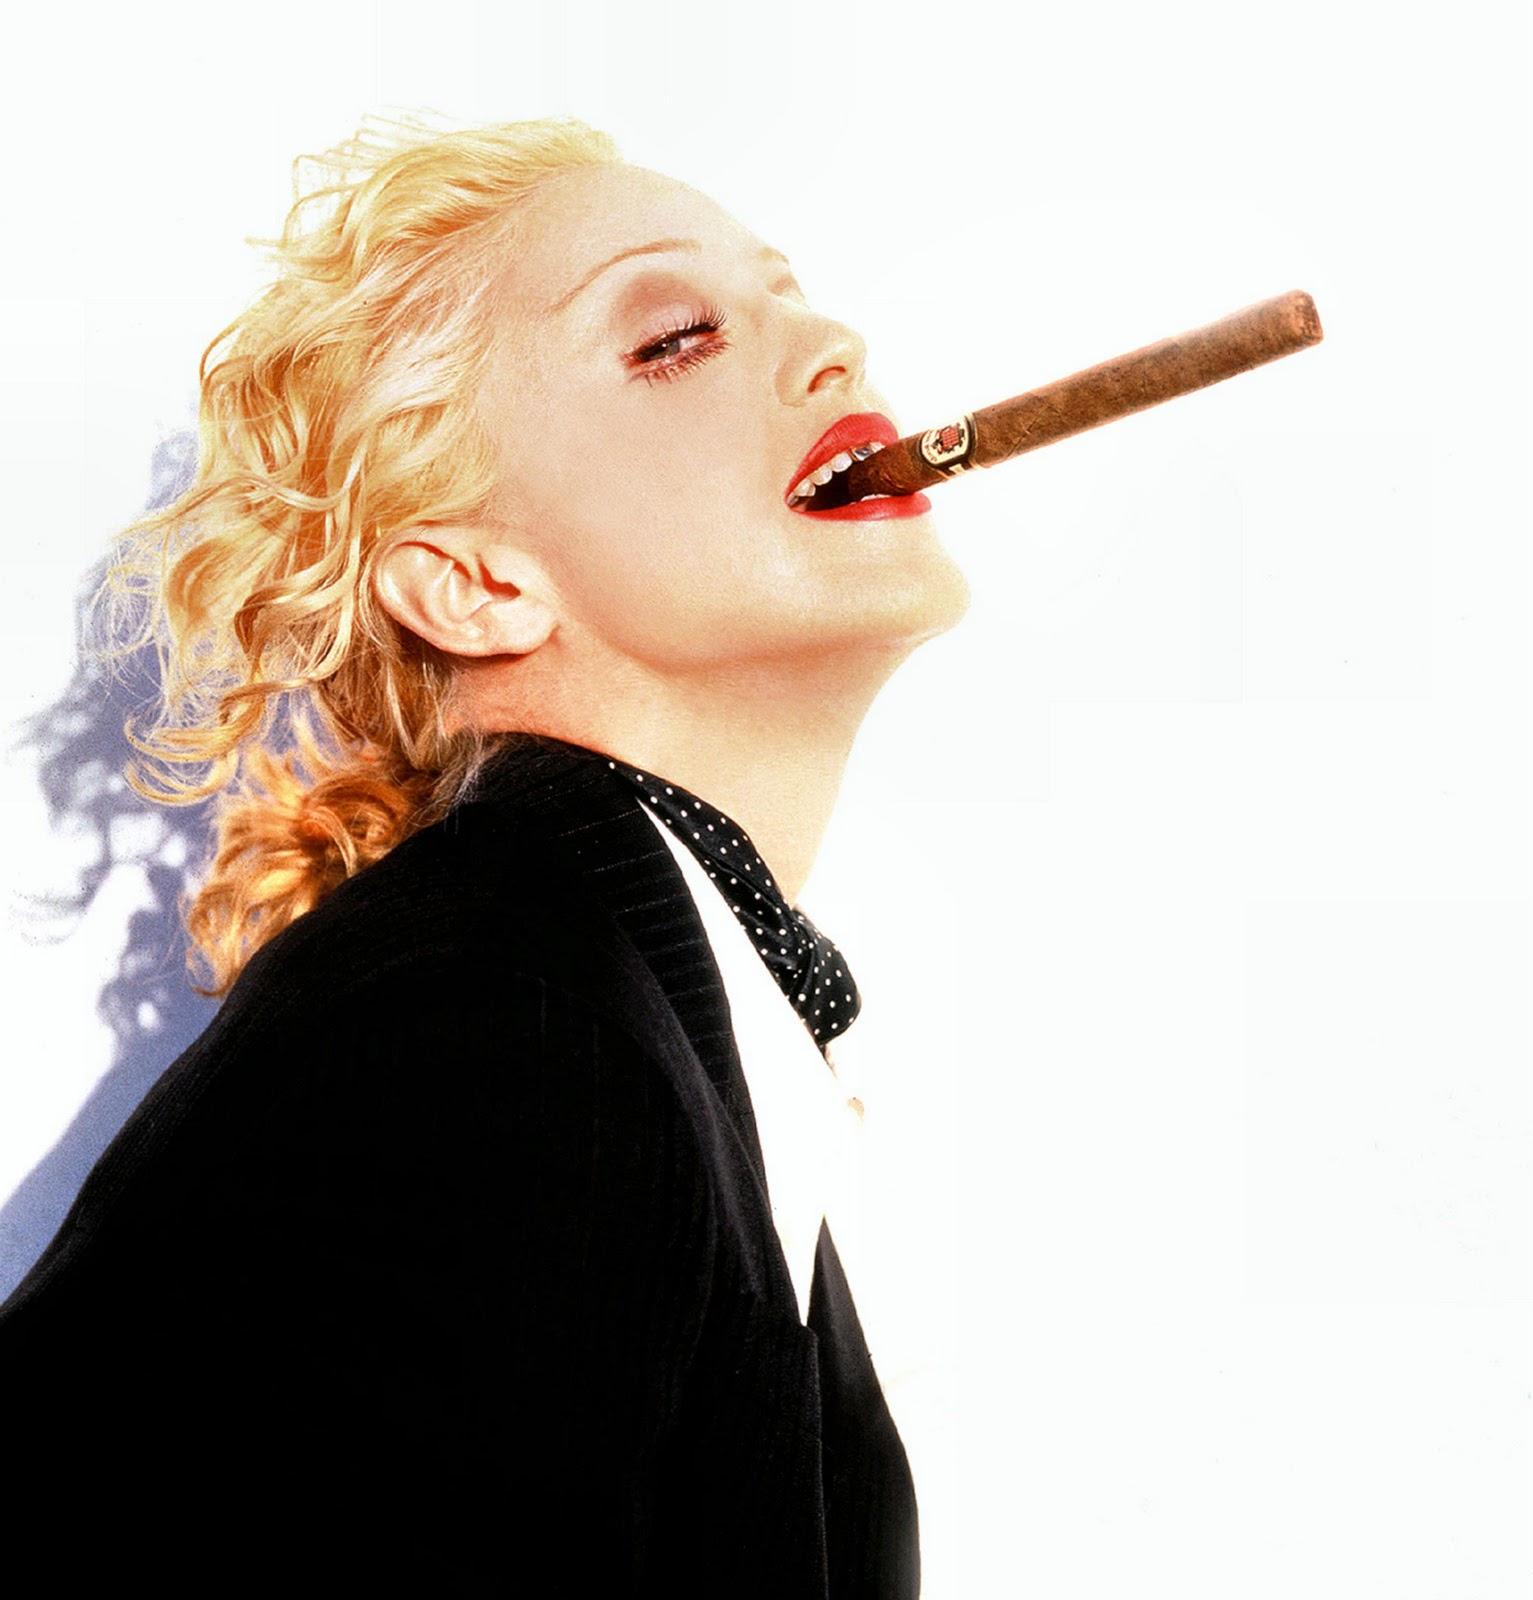 http://1.bp.blogspot.com/-nwC0zK0WyPM/TtocIeWi7hI/AAAAAAAAIX4/iVU7-LaczWA/s1600/cigar8.jpg